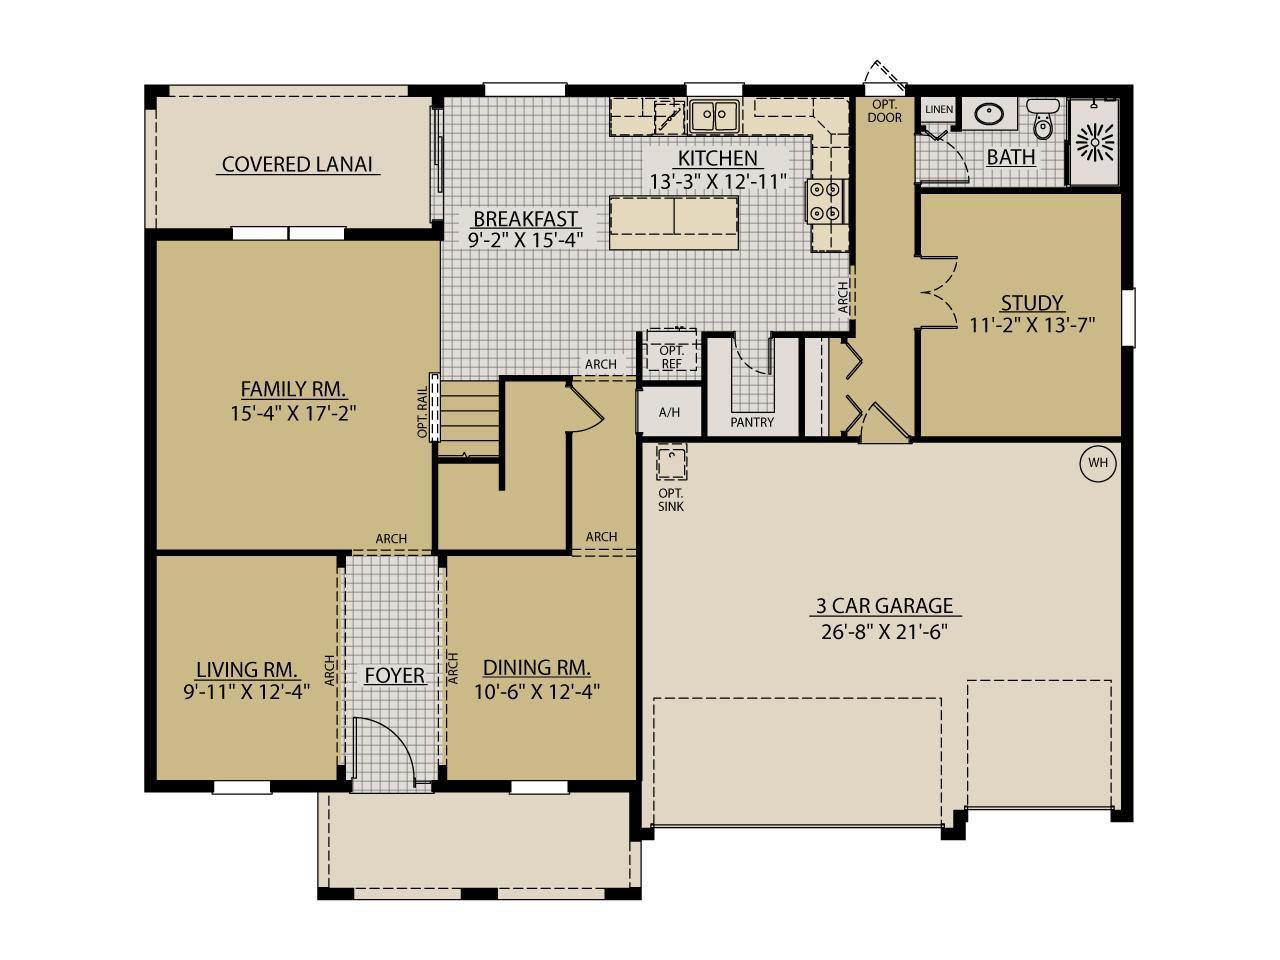 Jeppeson New Home Floor Plan – William Ryan Homes Floor Plans